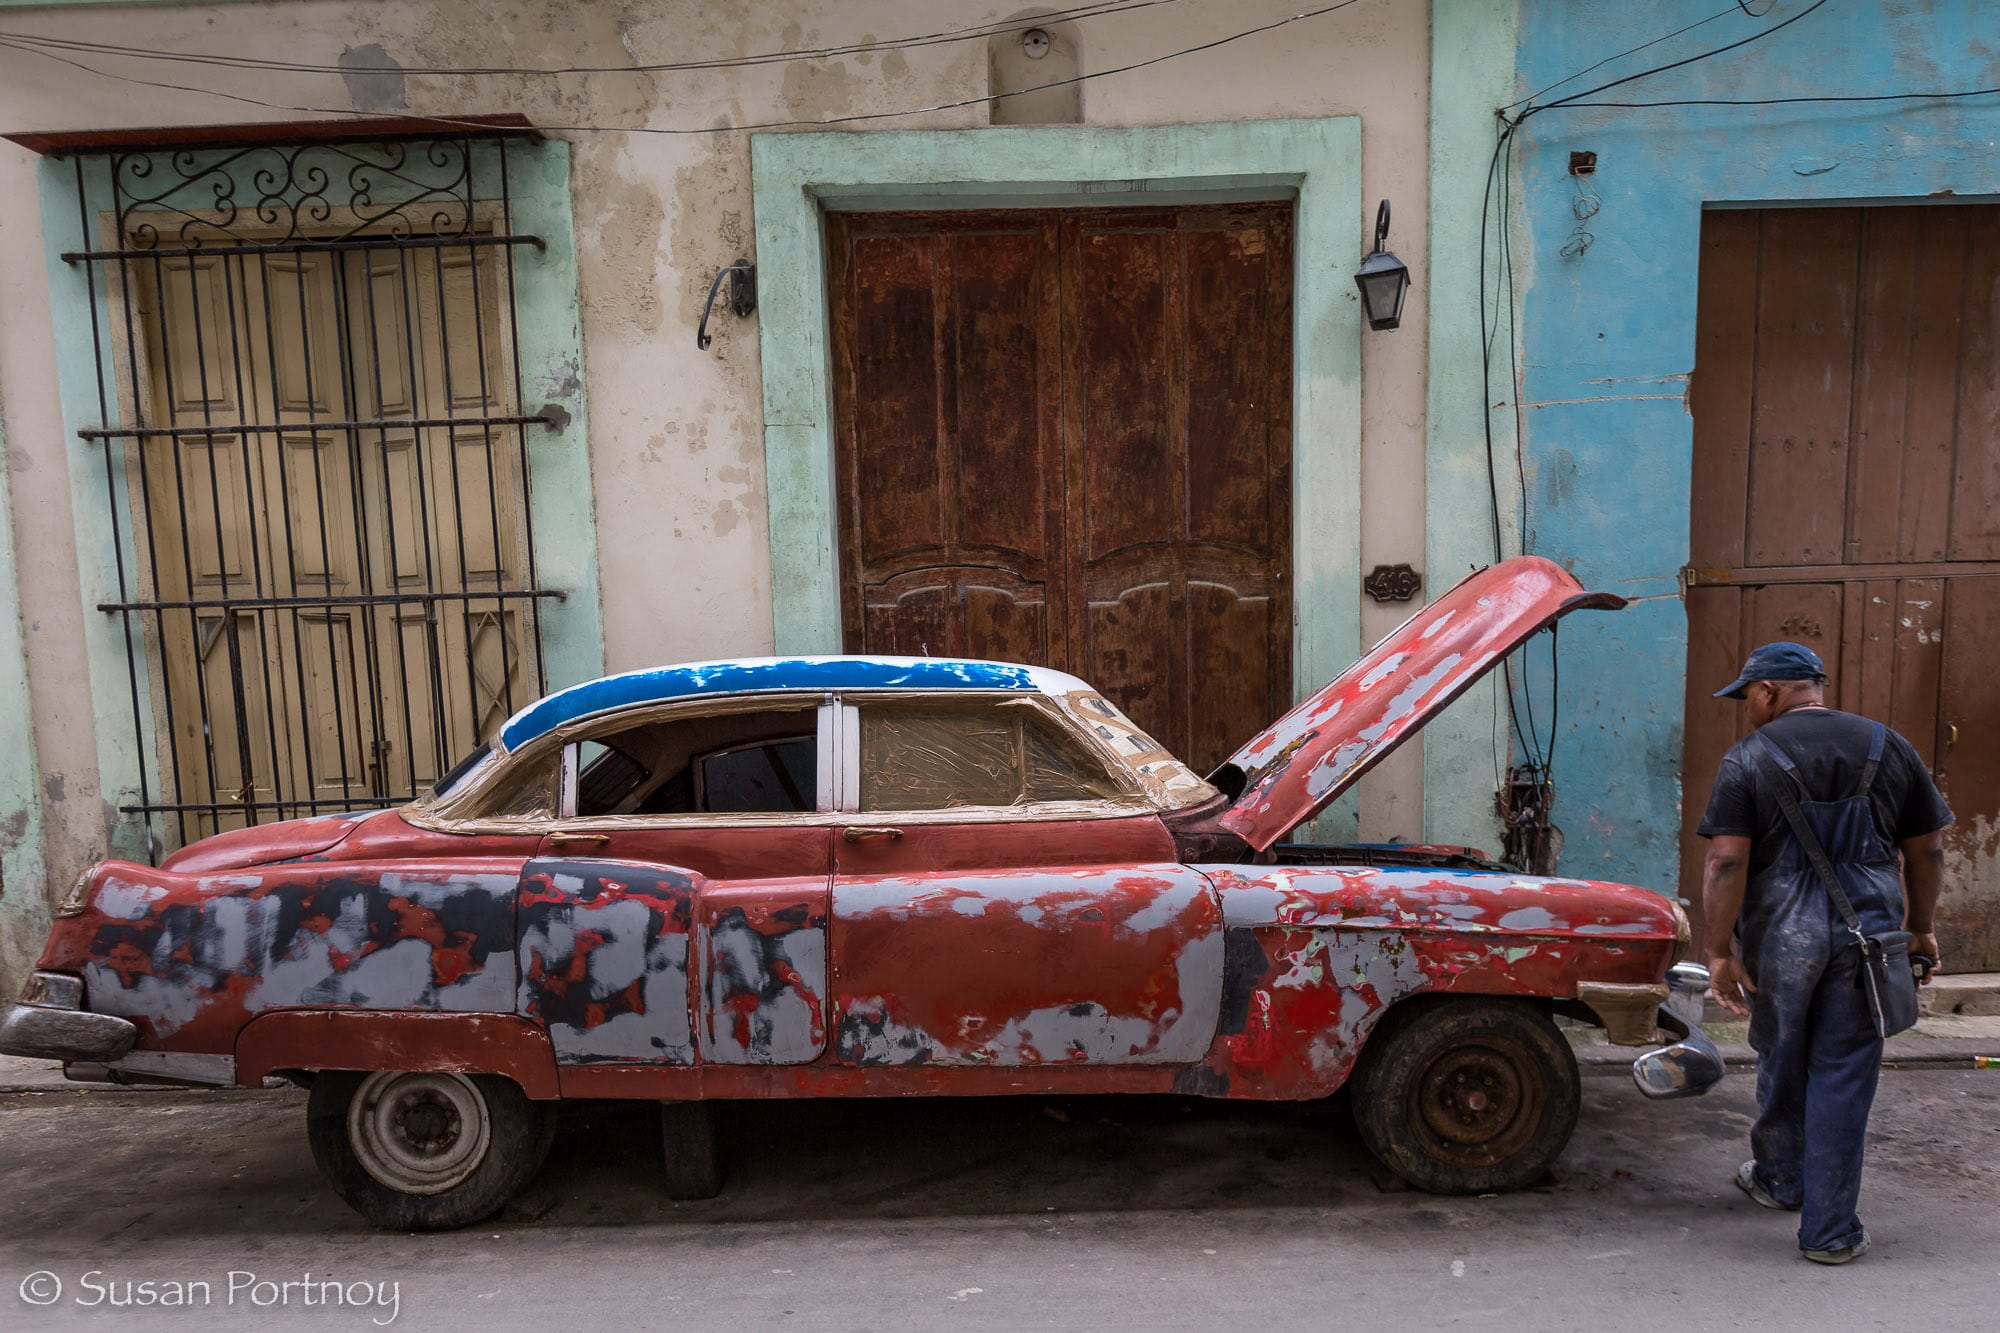 Beat up classic car driving in Havana, Cuba